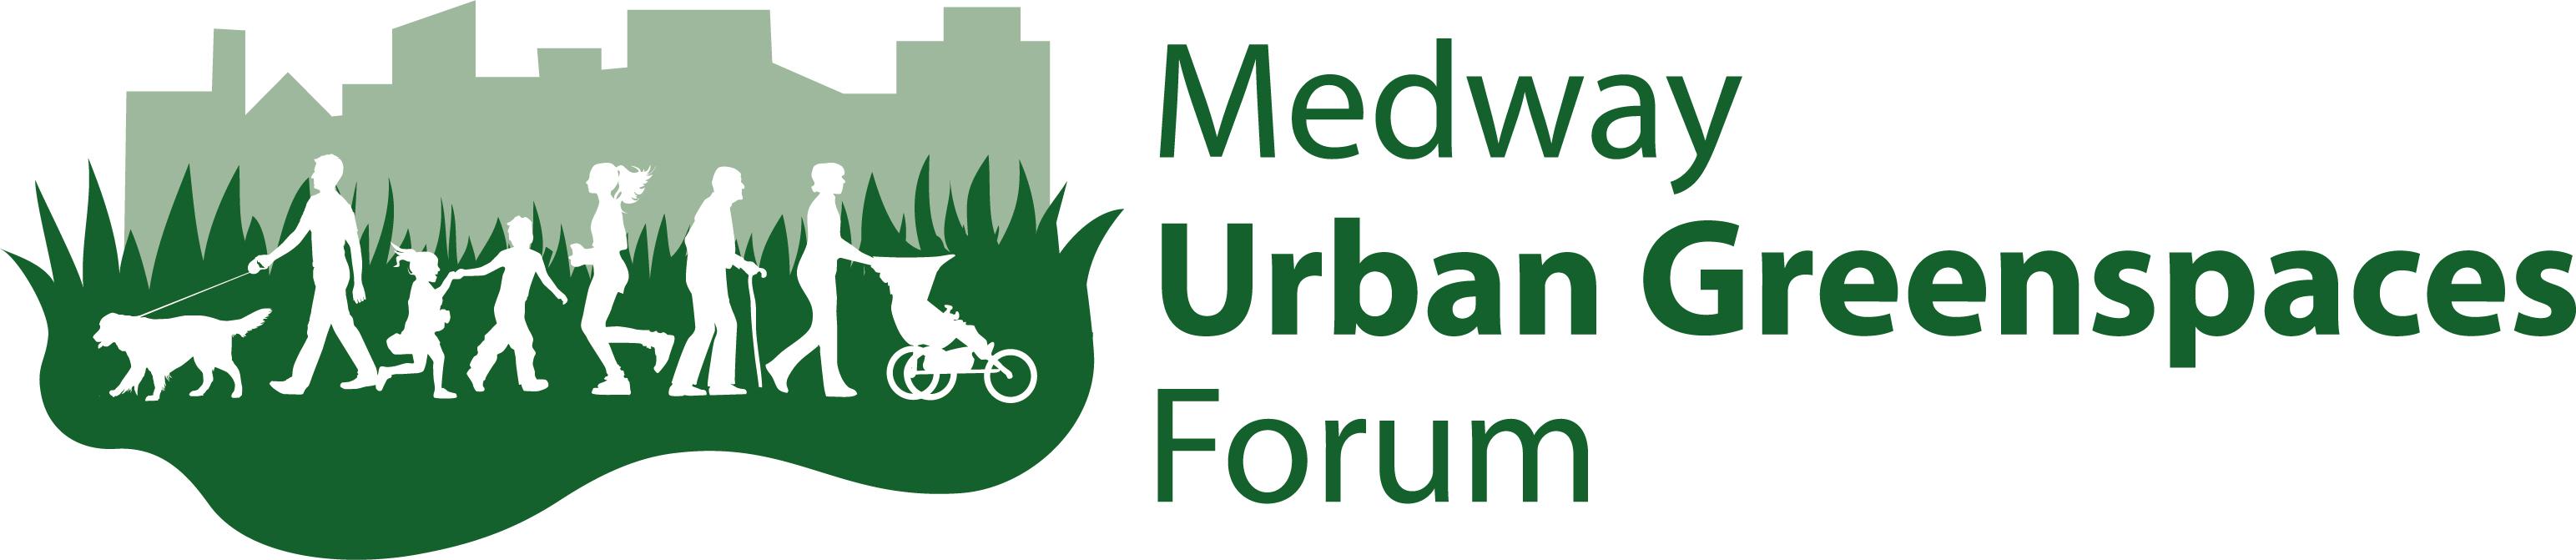 Medway Urban Greenspaces Forum